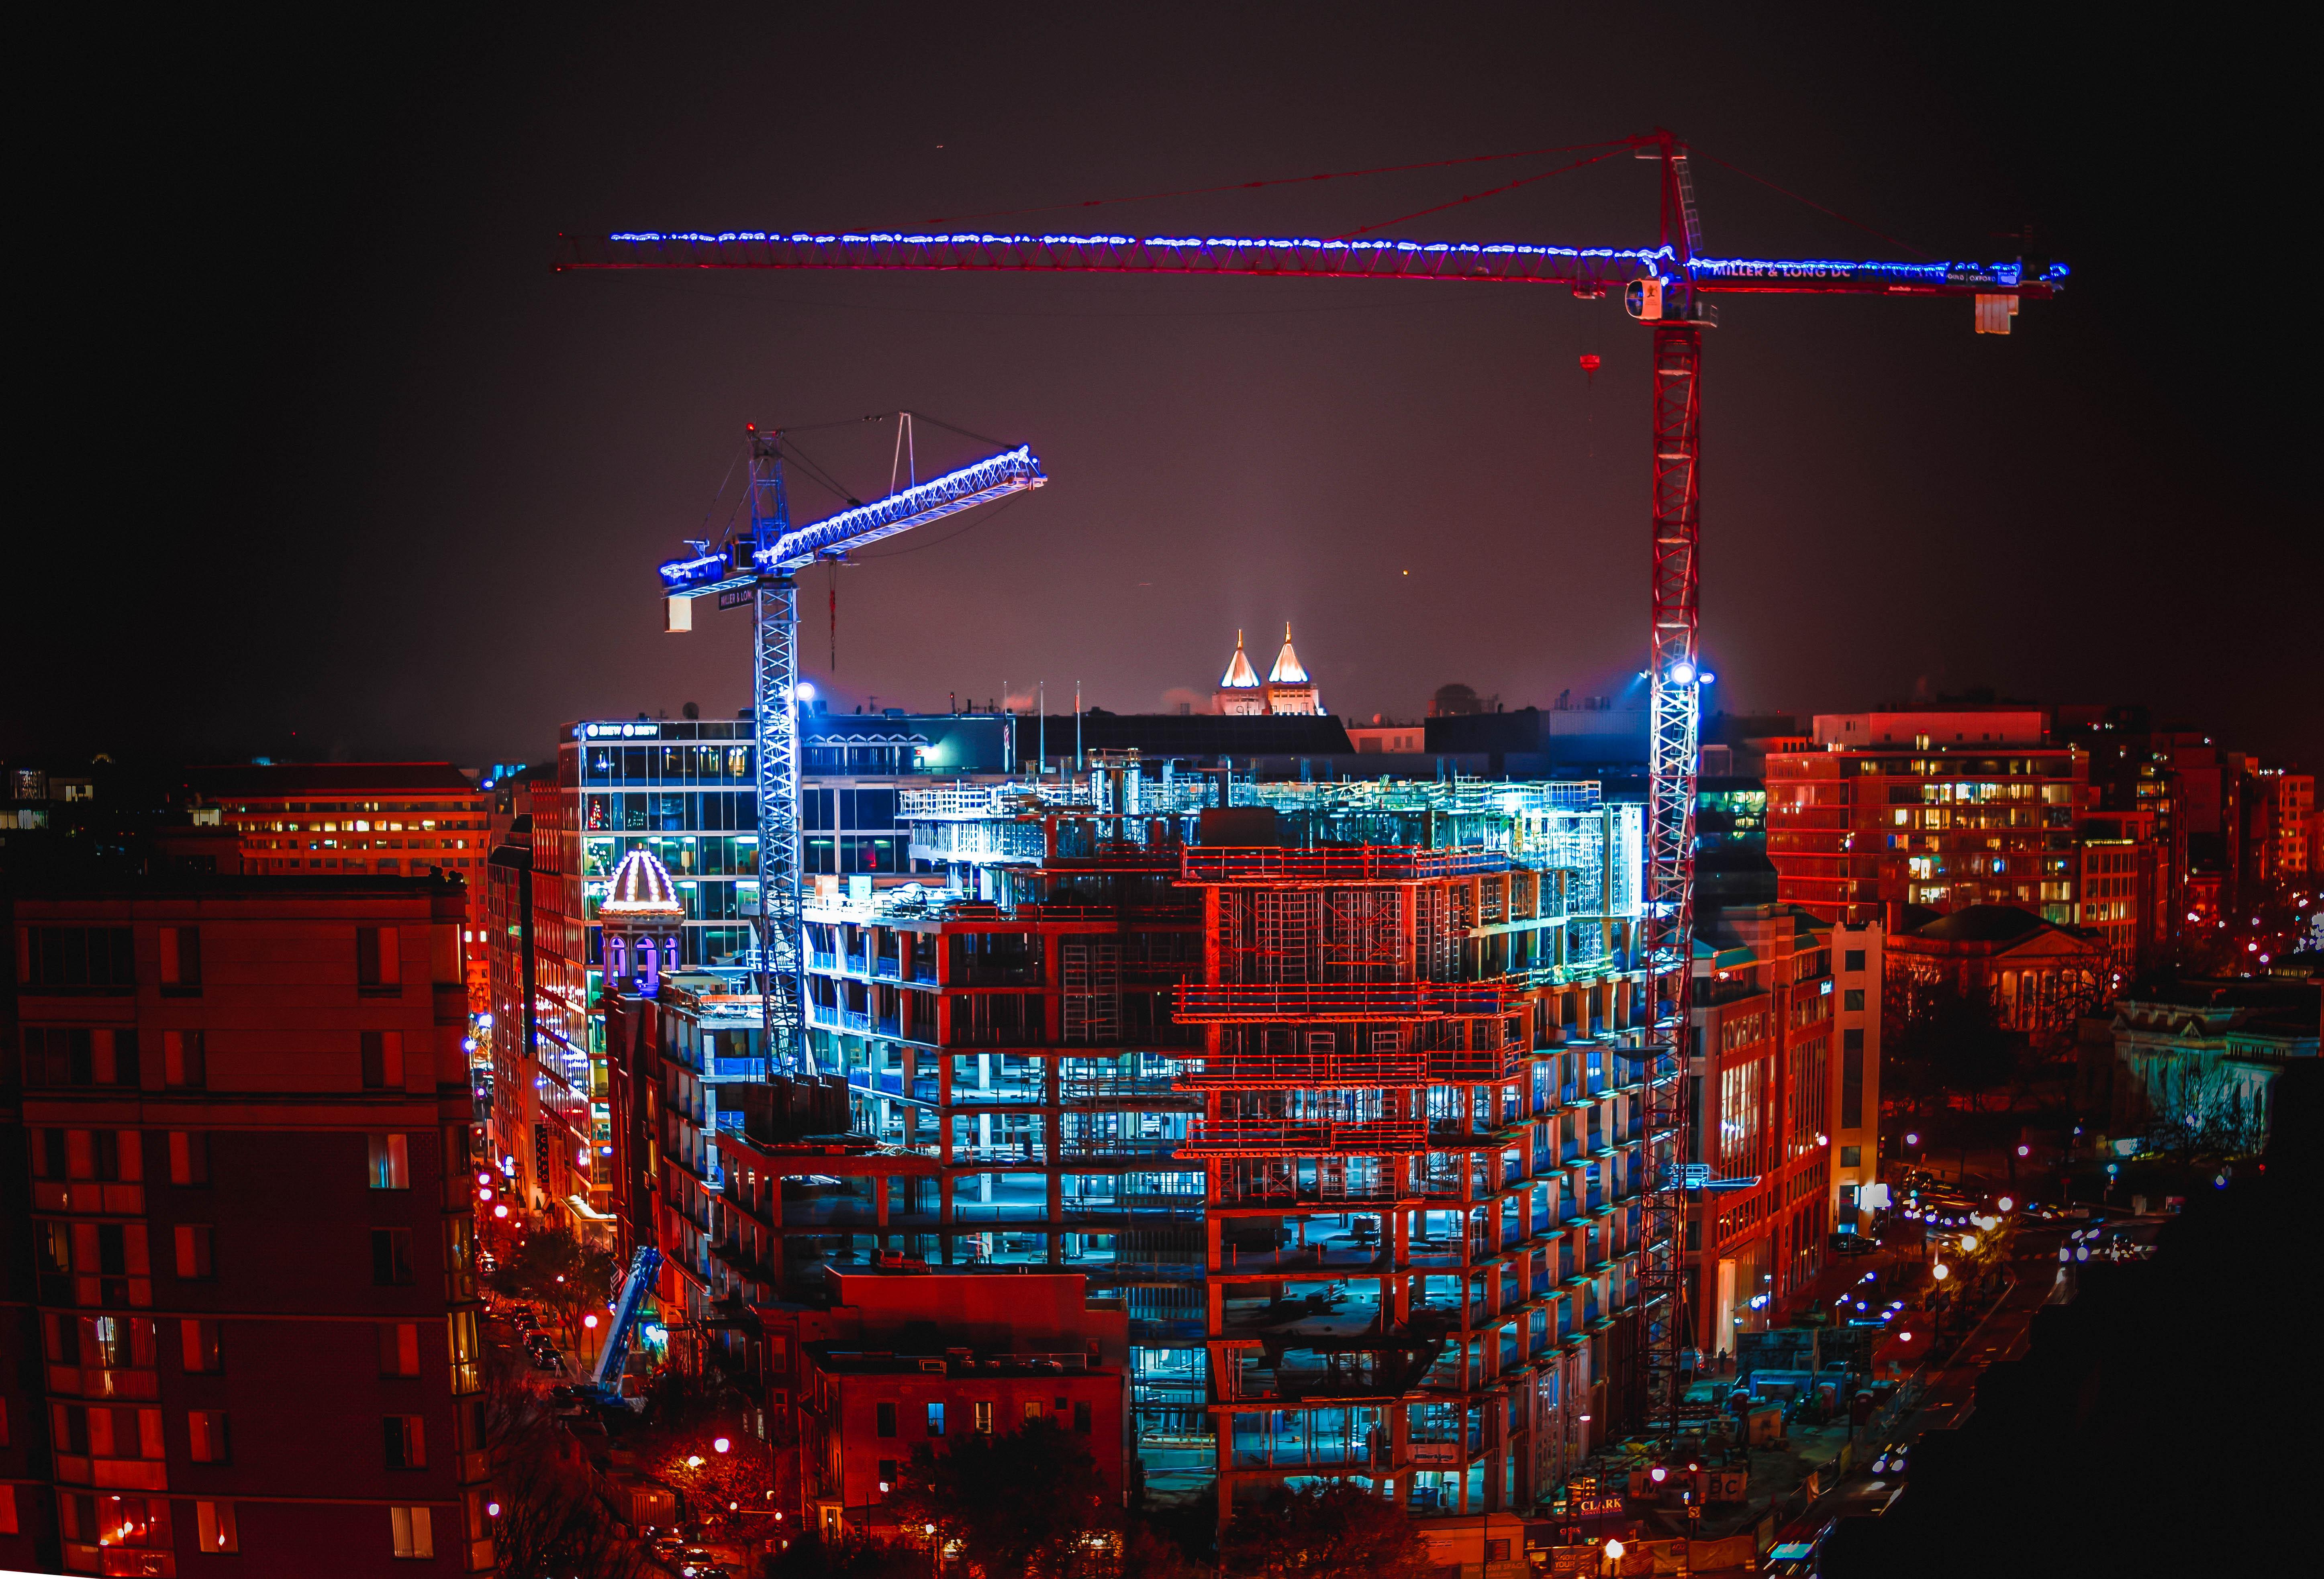 Glowing Night Cranes in Washington, DC, Blue, District, Urban, Skyline, HQ Photo